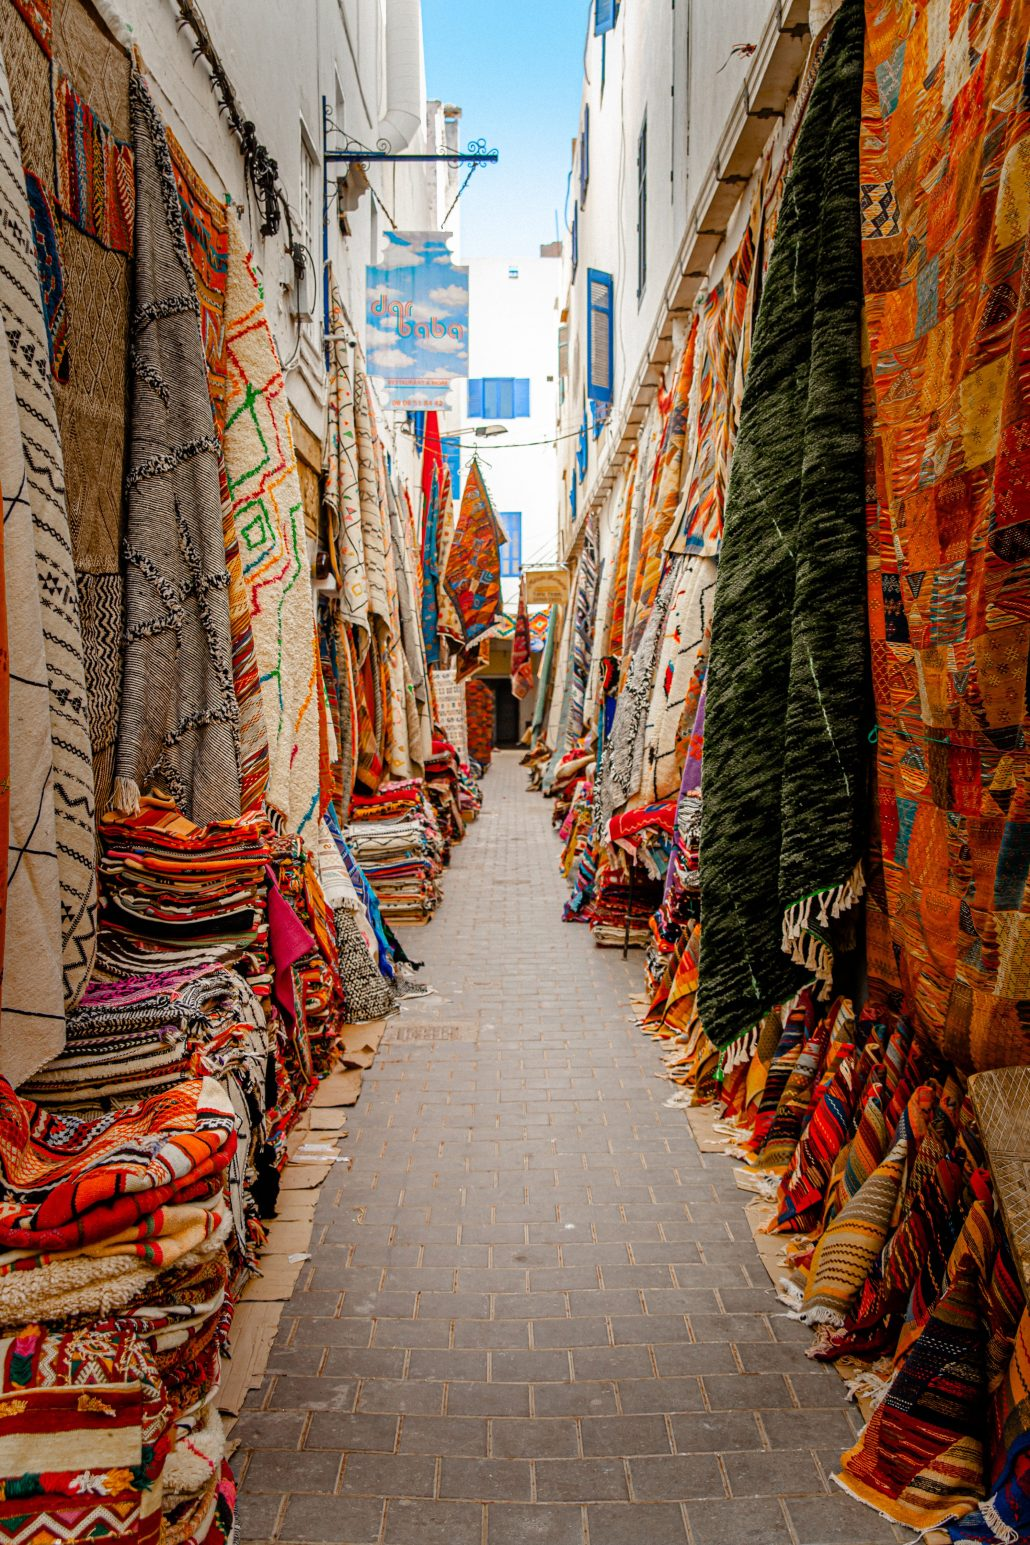 Tapis de rue – Maroc